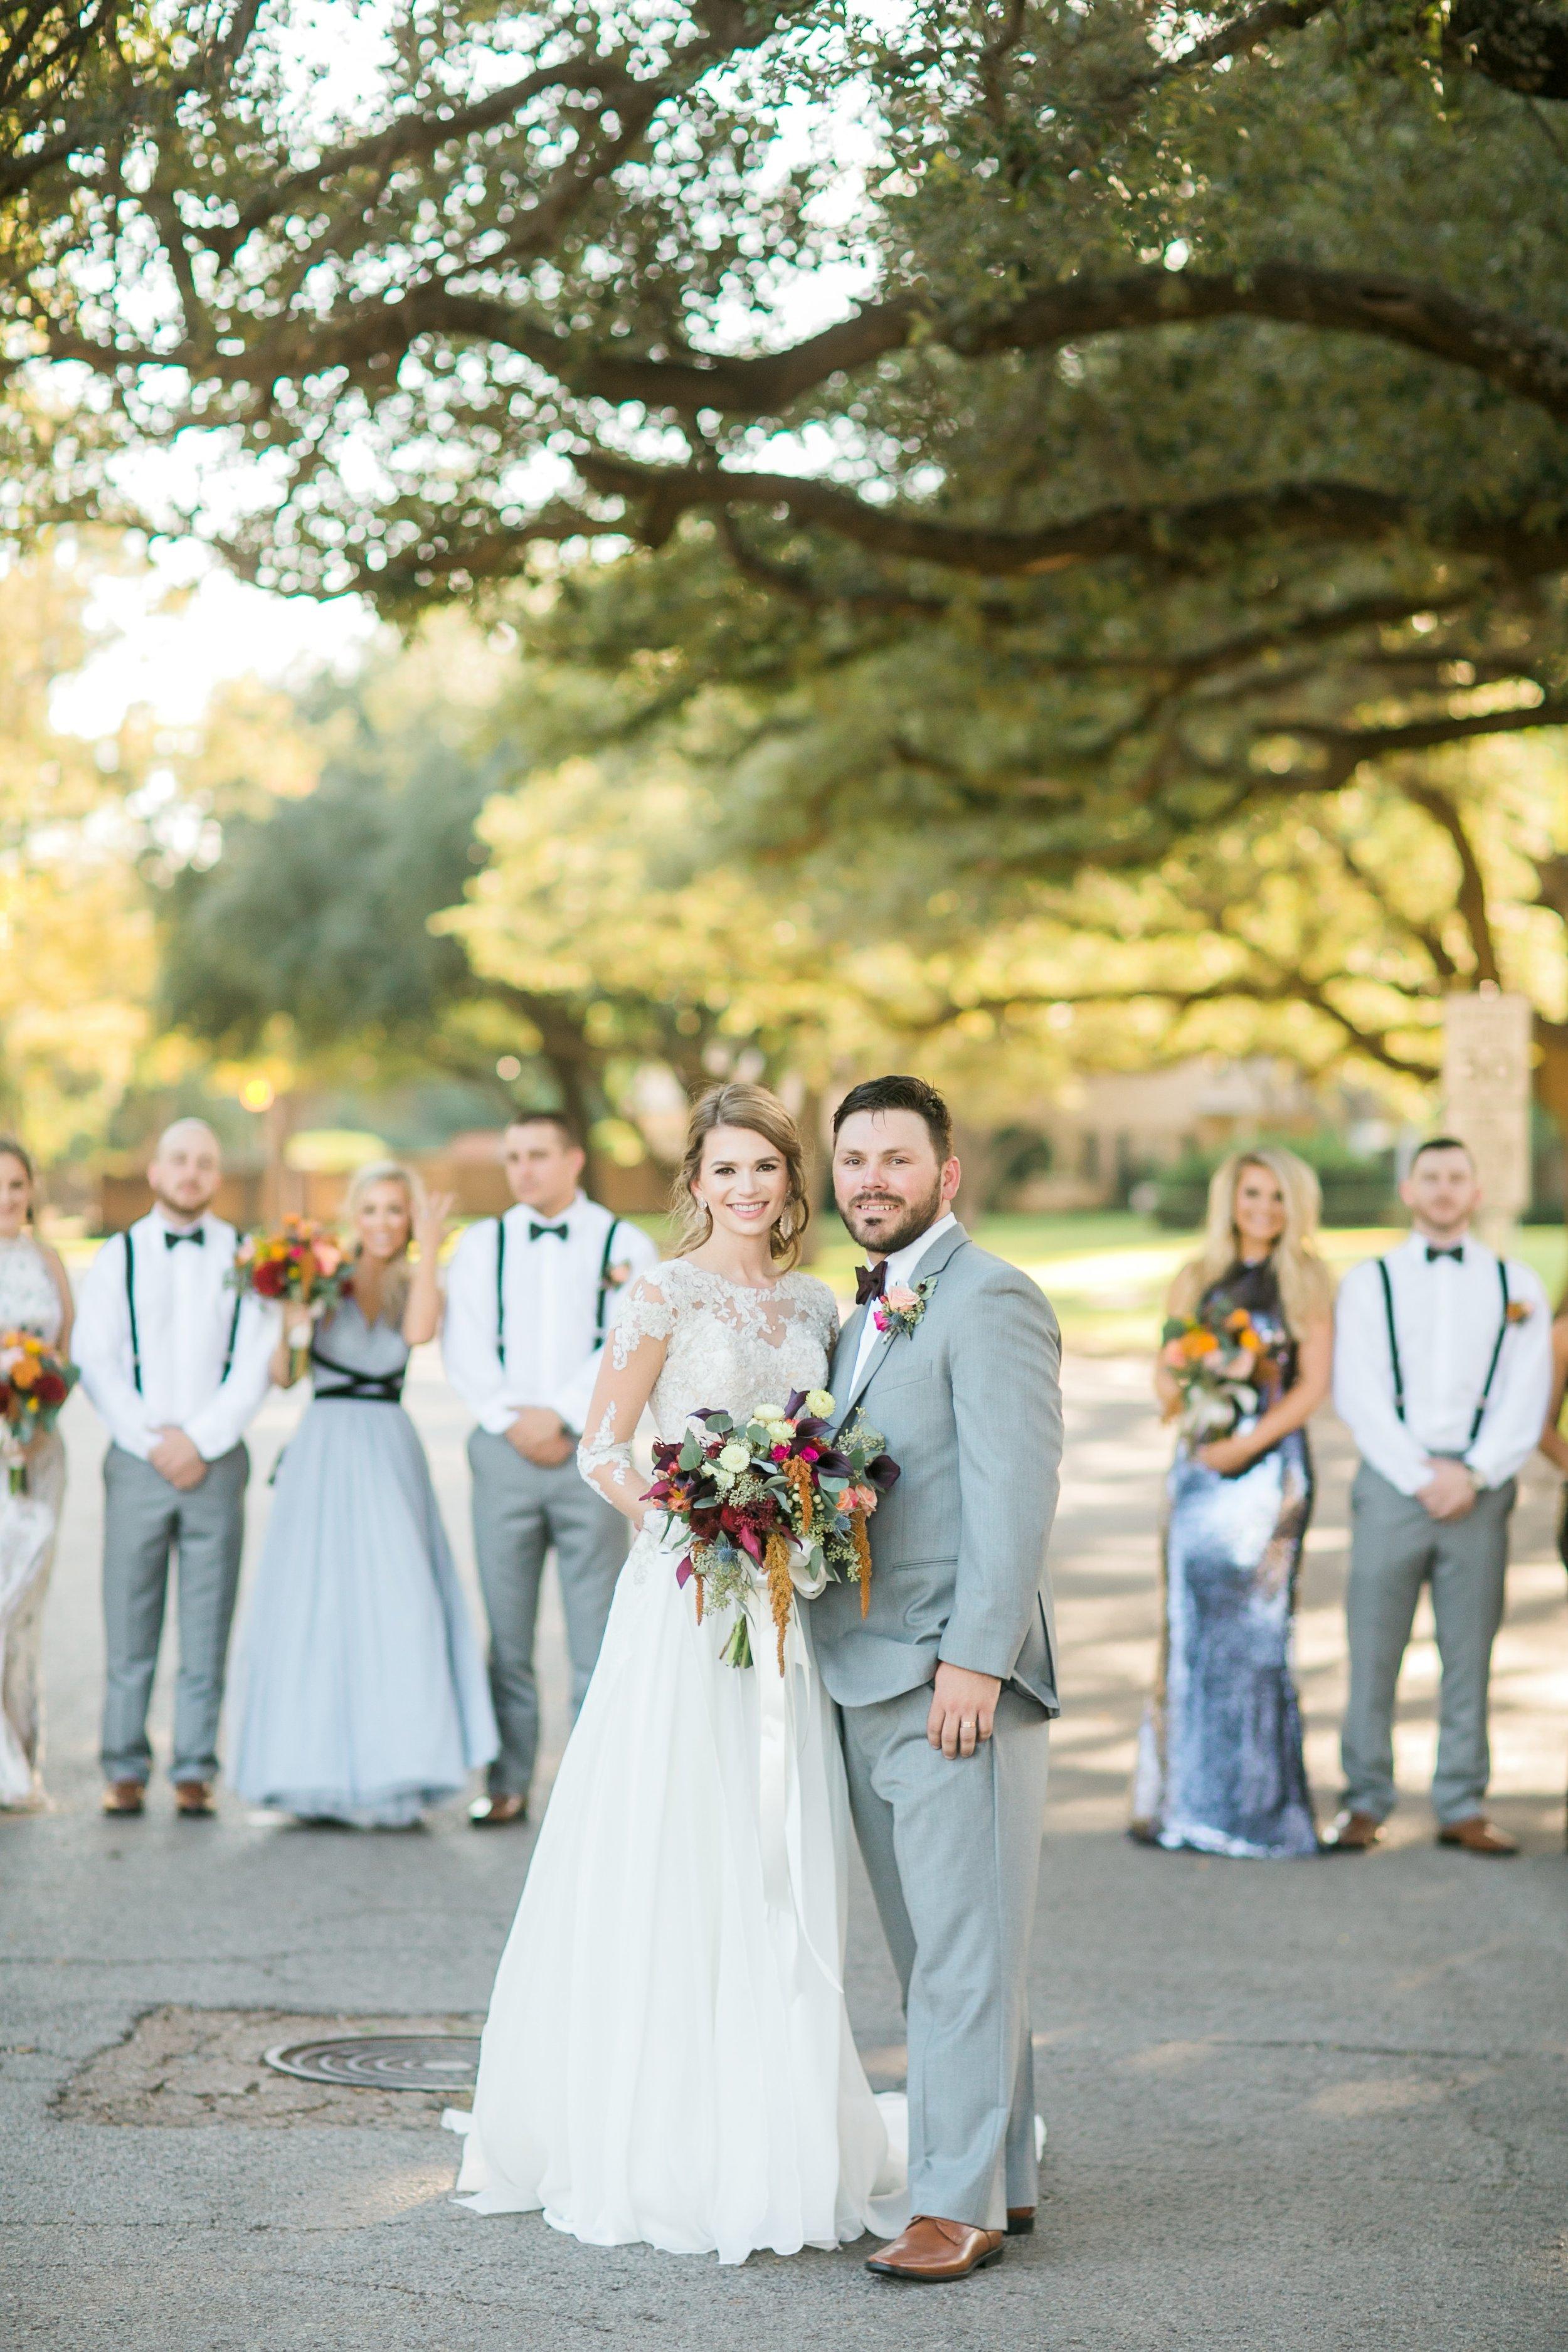 Roberson-Wedding-The-Forum-Lauren-Pinson-Wedding-Photography-Wichita-Falls-Texas-062.jpg